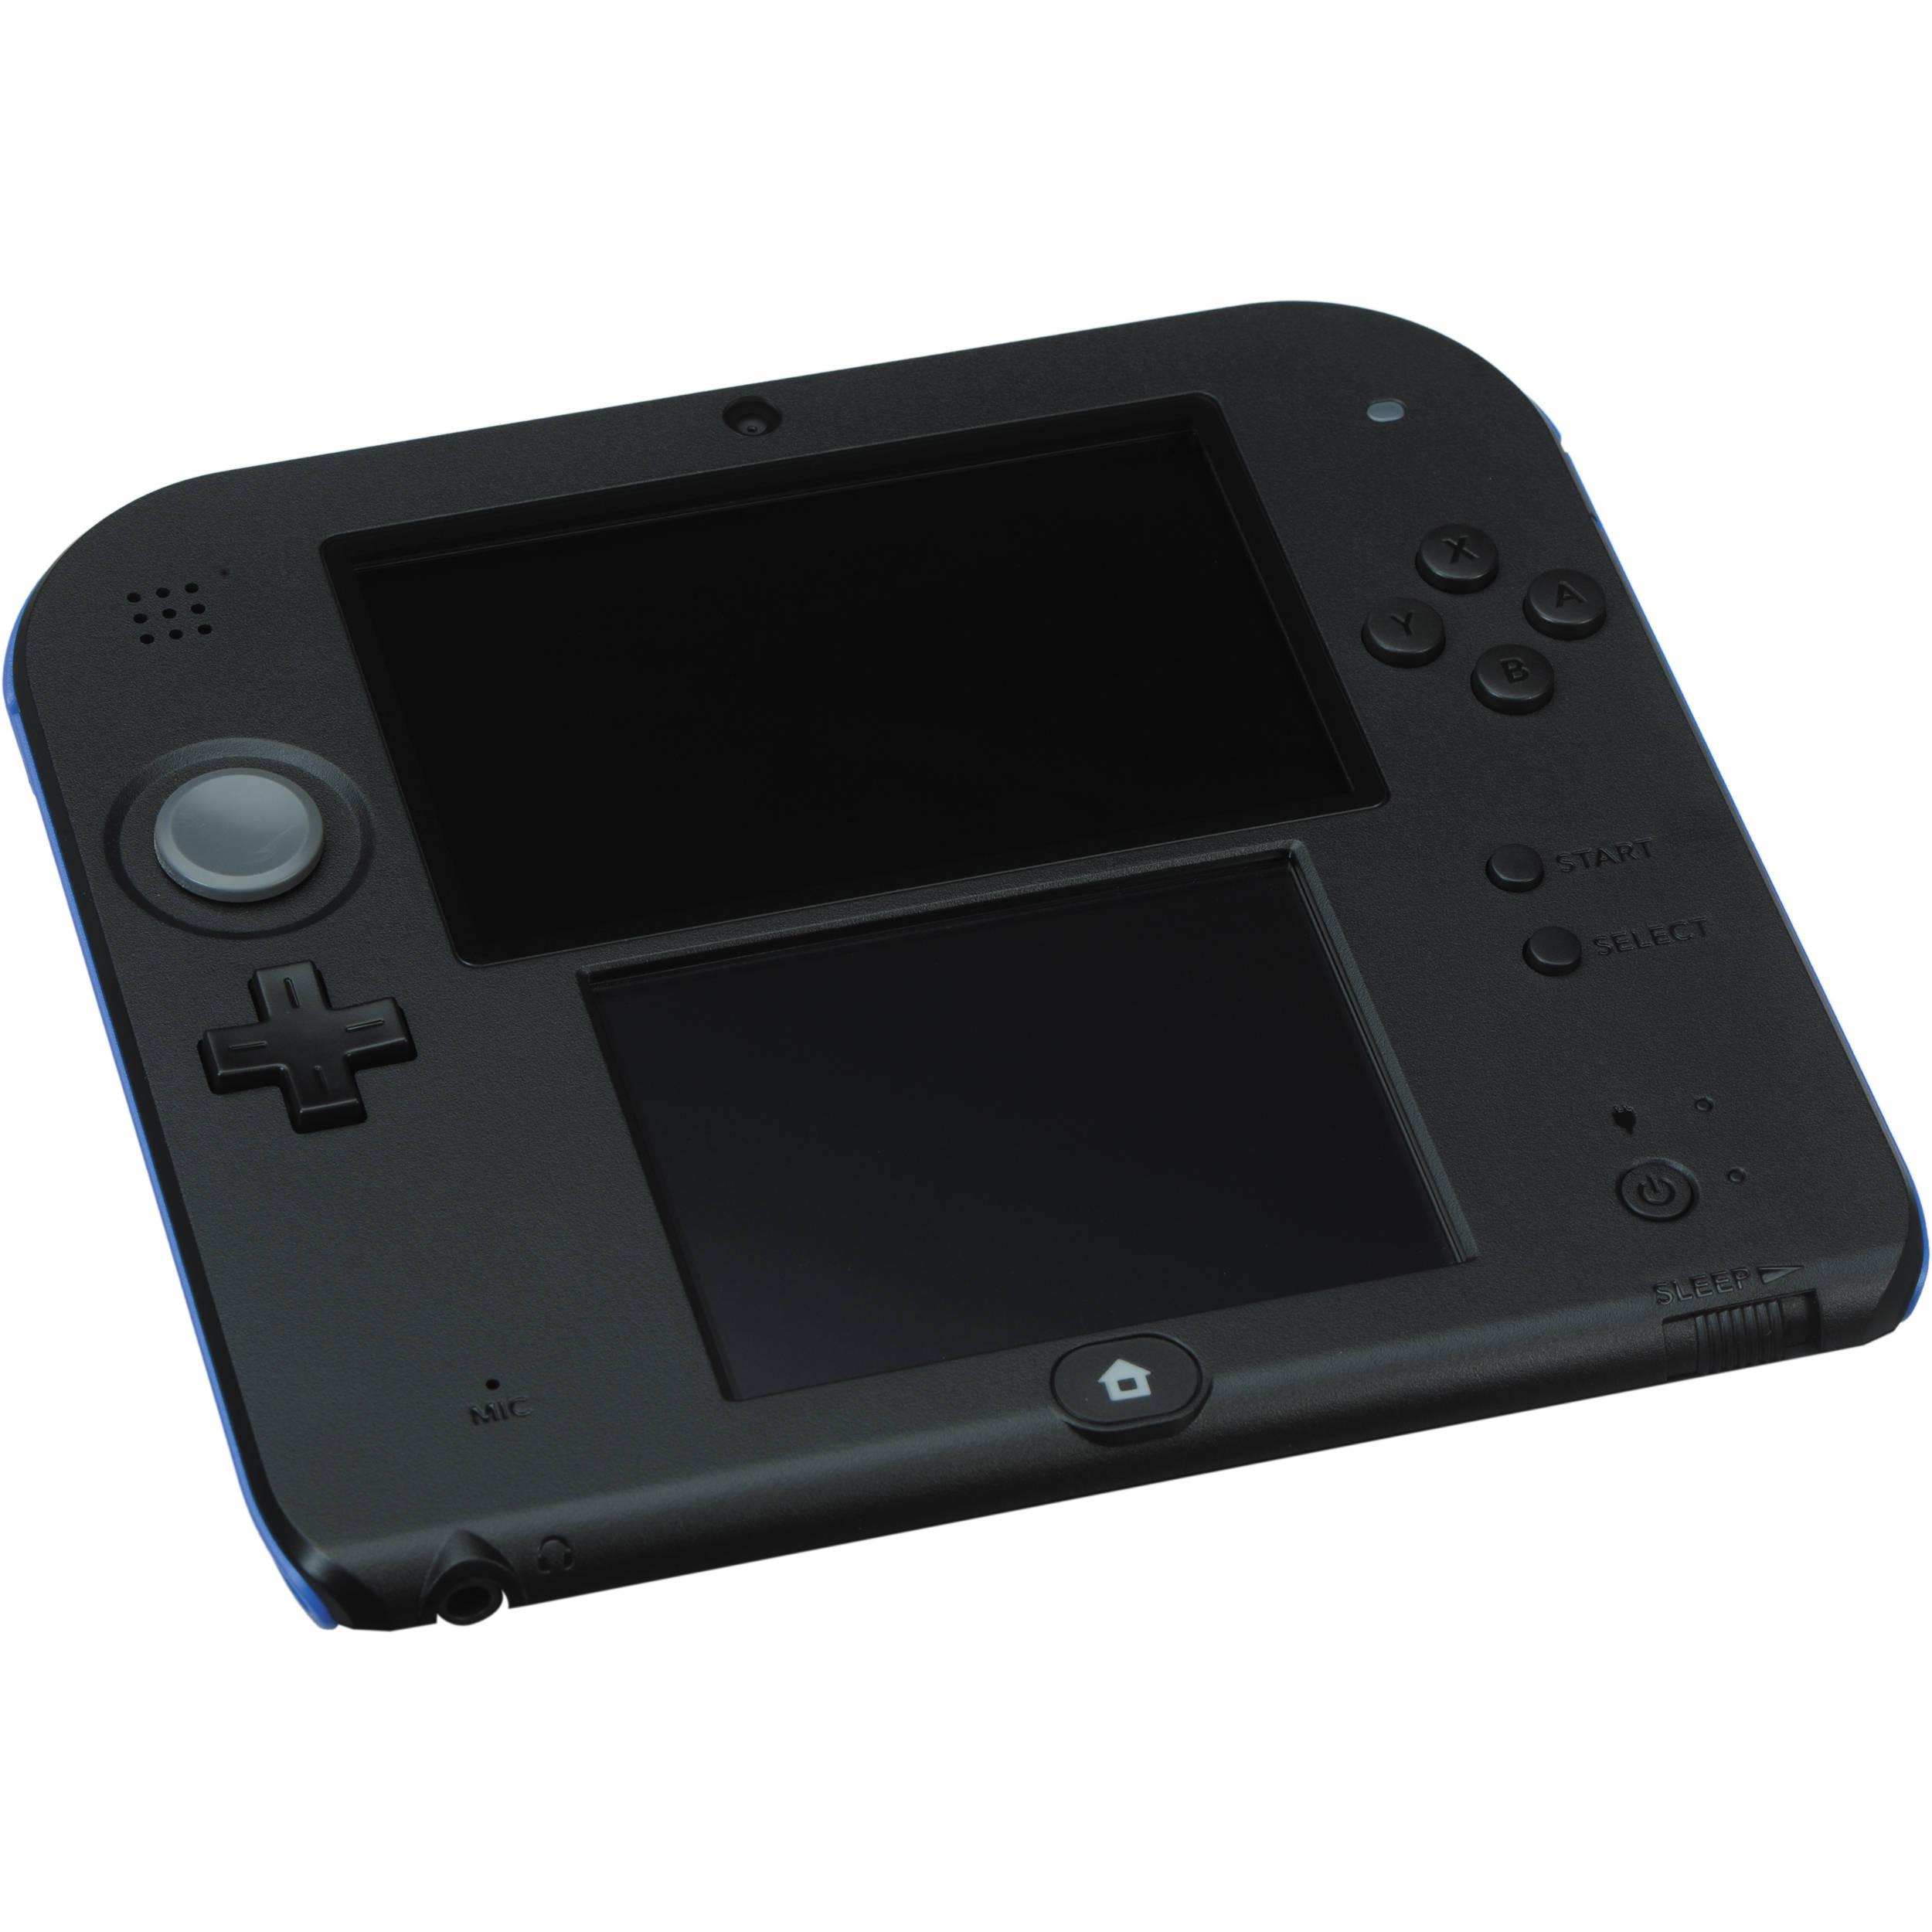 Nintendo 2DS Mario Kart 7 Bundle (Electric Blue) FTRSBM11 B&H